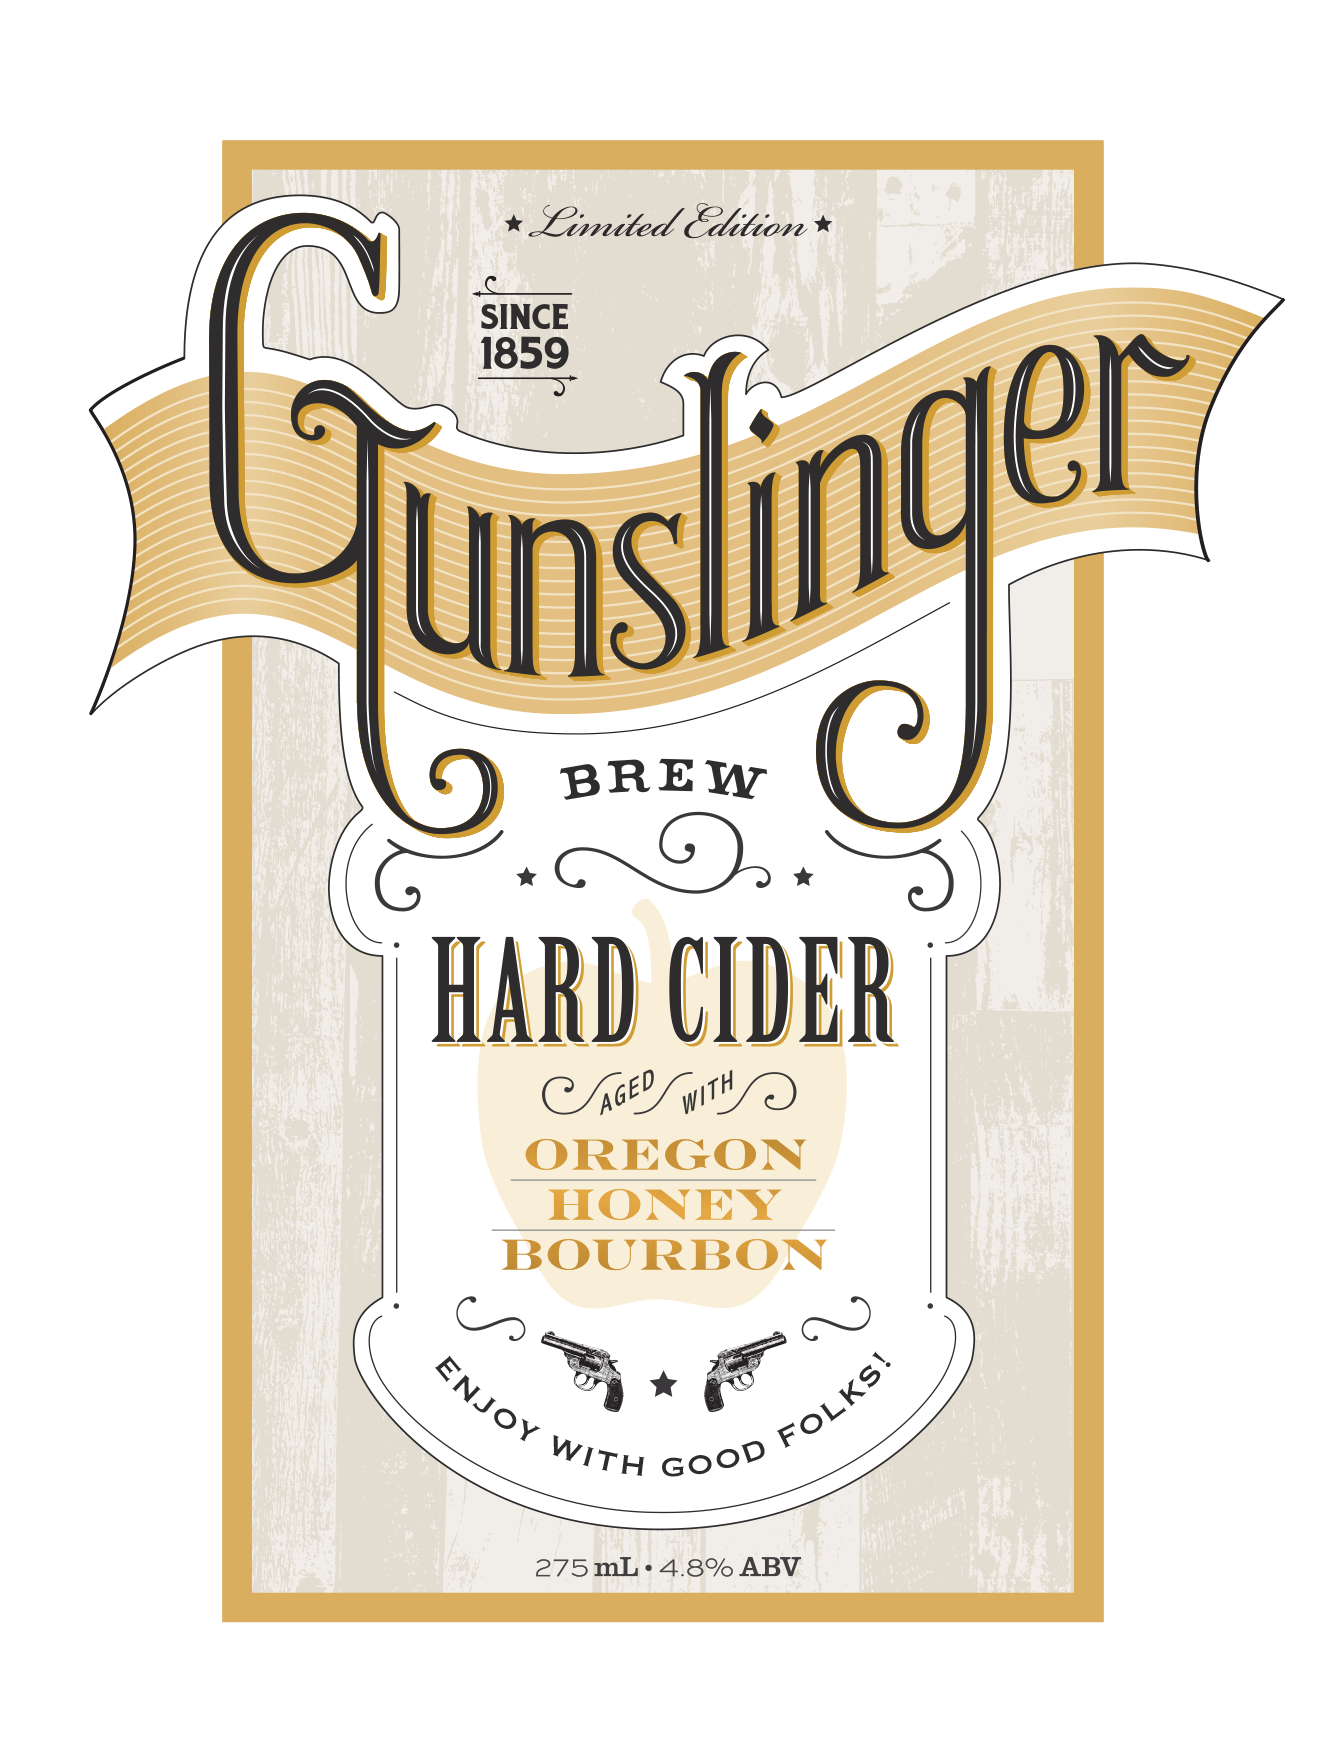 The Gunslinger Brew Label